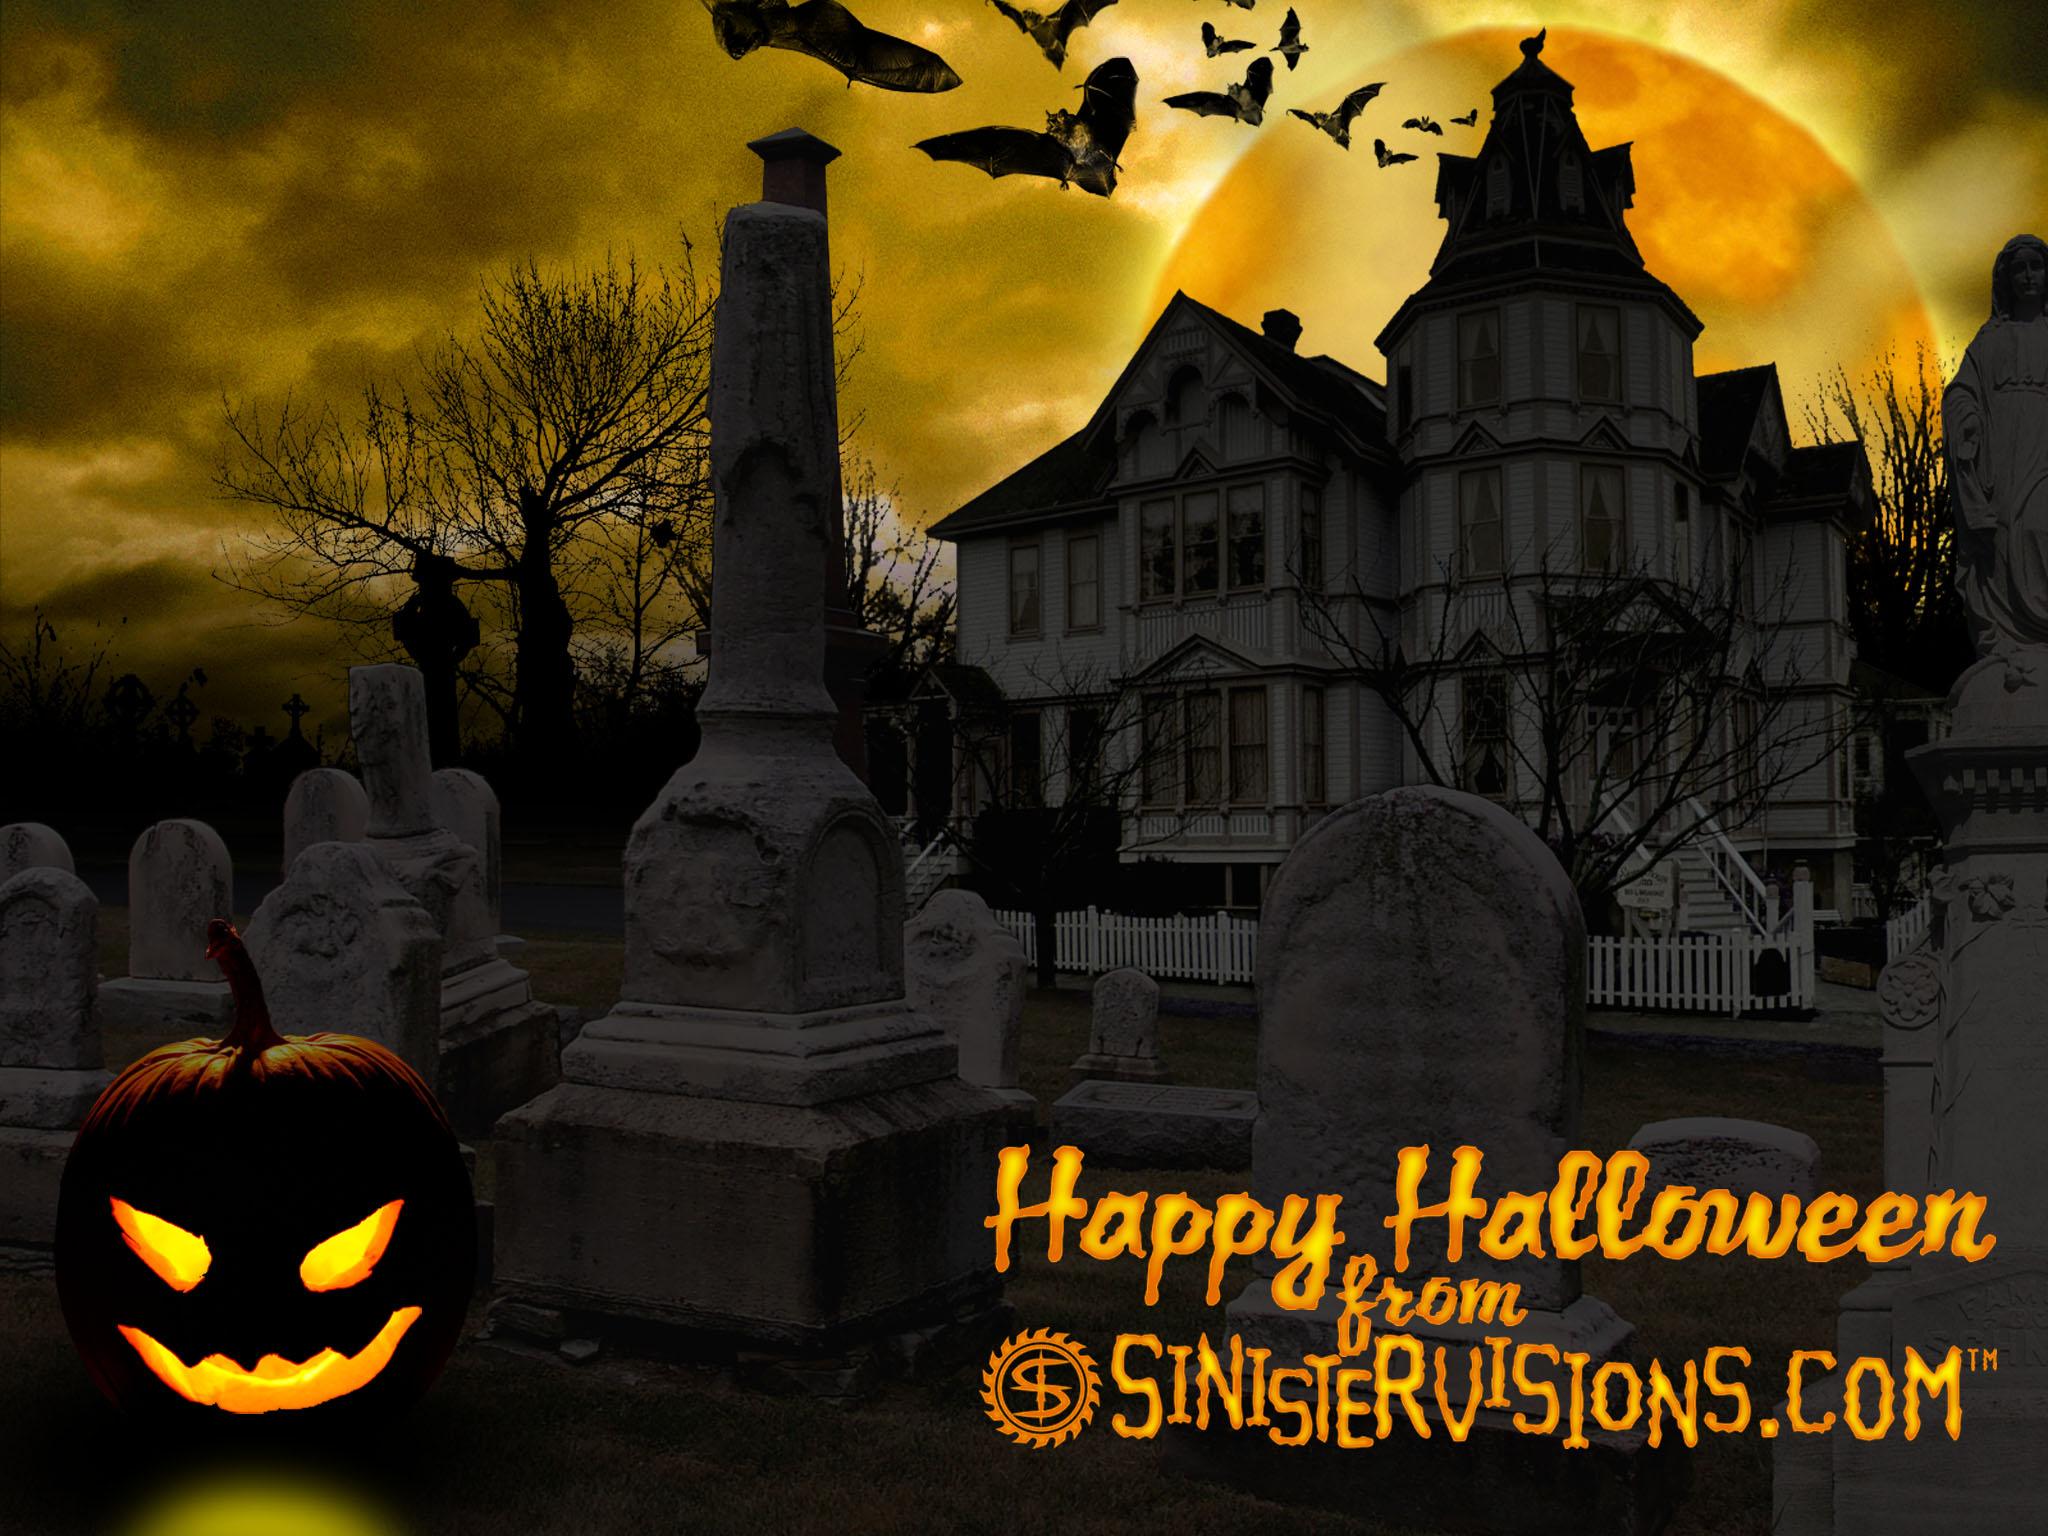 Halloween Wallpapers 30 Spooky Backgrounds for Your Desktop 2048x1536